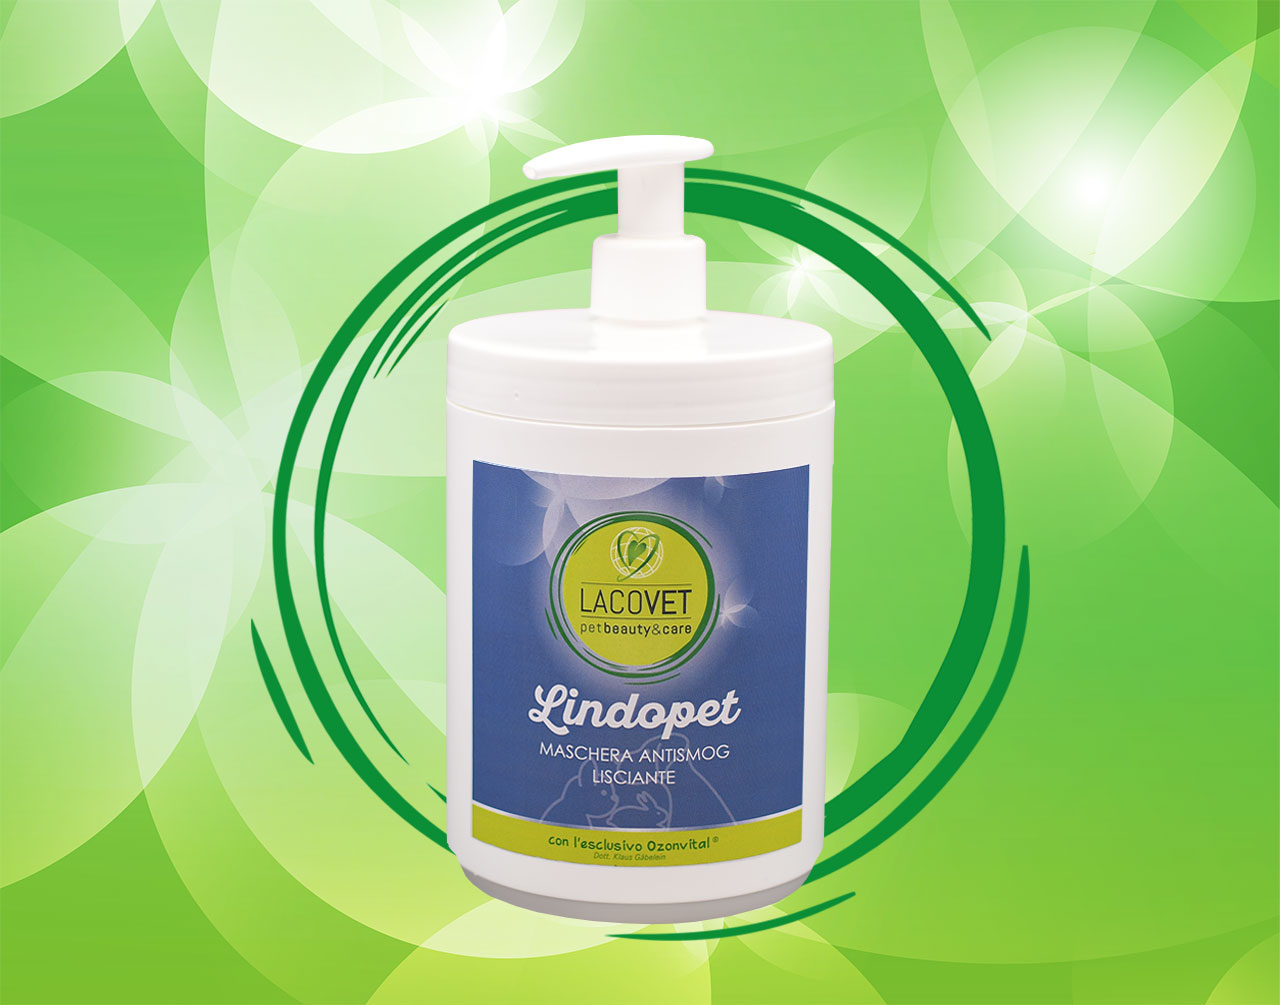 LINDOPET maschera antismog effetto lisciante - LACOVET pet beauty&care